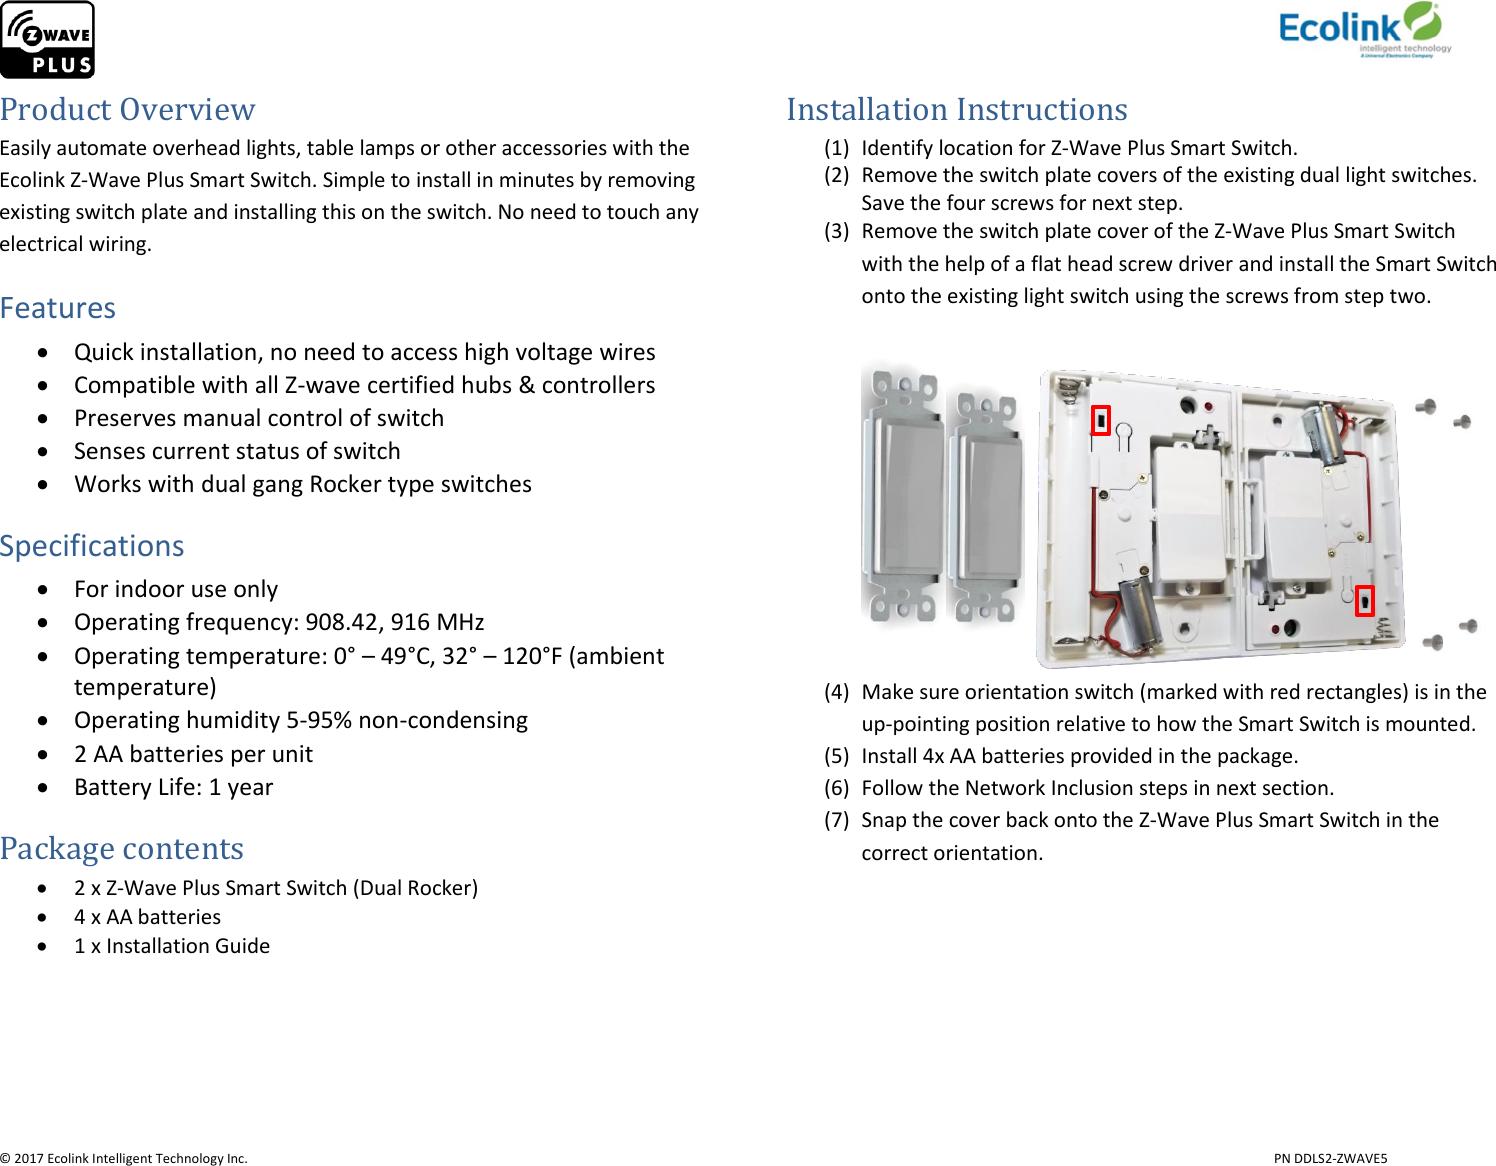 B07dcklwvw Ecolink Light Switch Ddls2 Zwave5 Manual Z Wave Wiring Diagram Page 2 Of 6